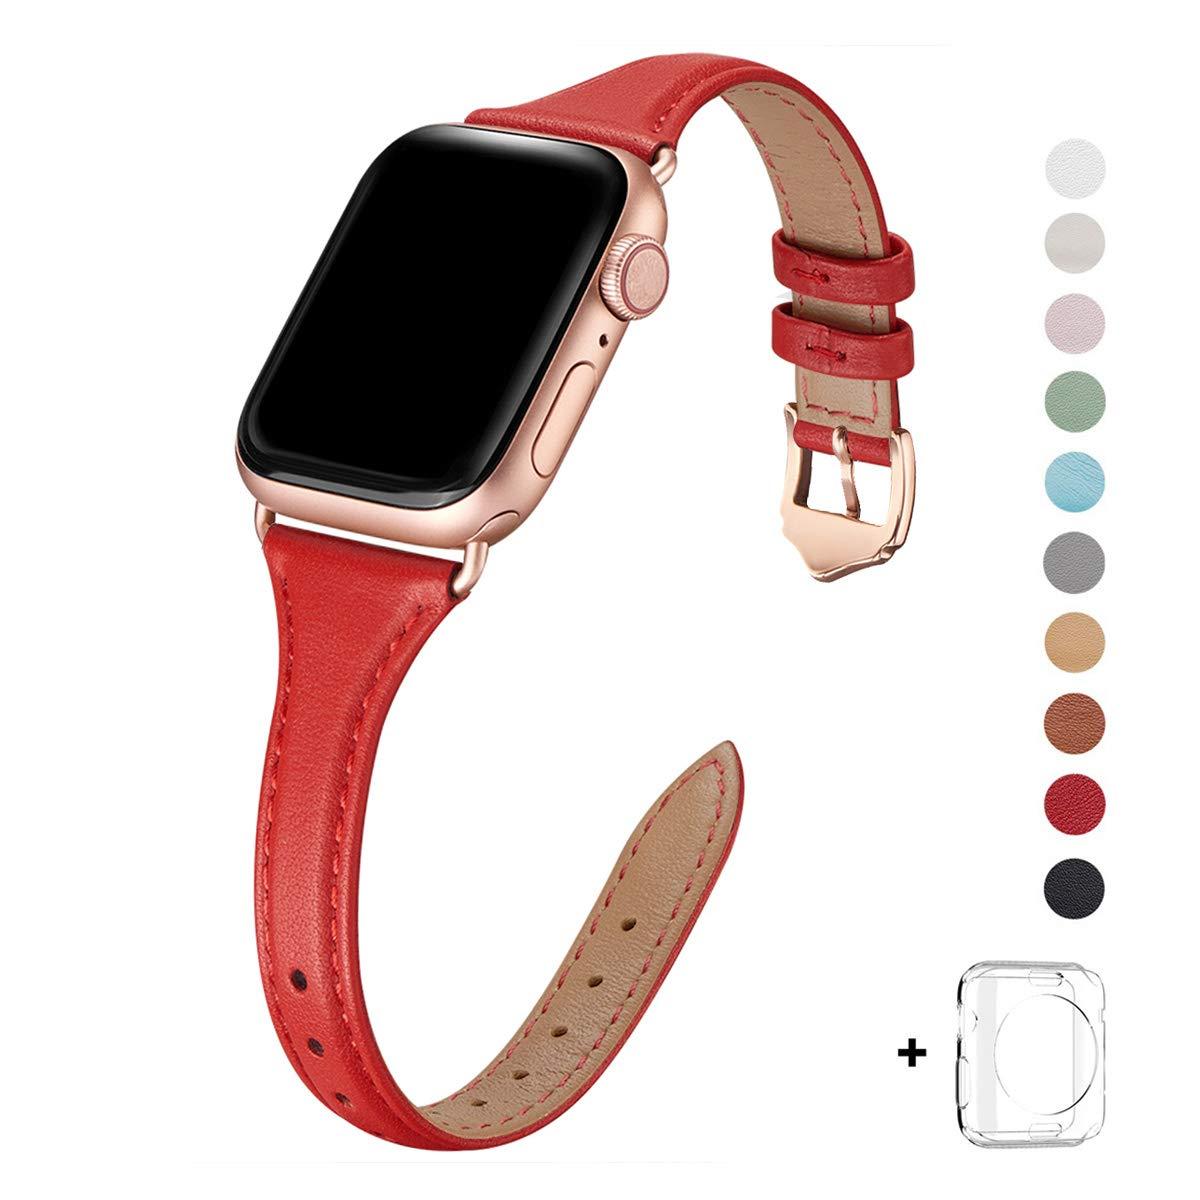 Malla Cuero para Apple Watch (42/44mm) WFEAGL [7W7592MK]